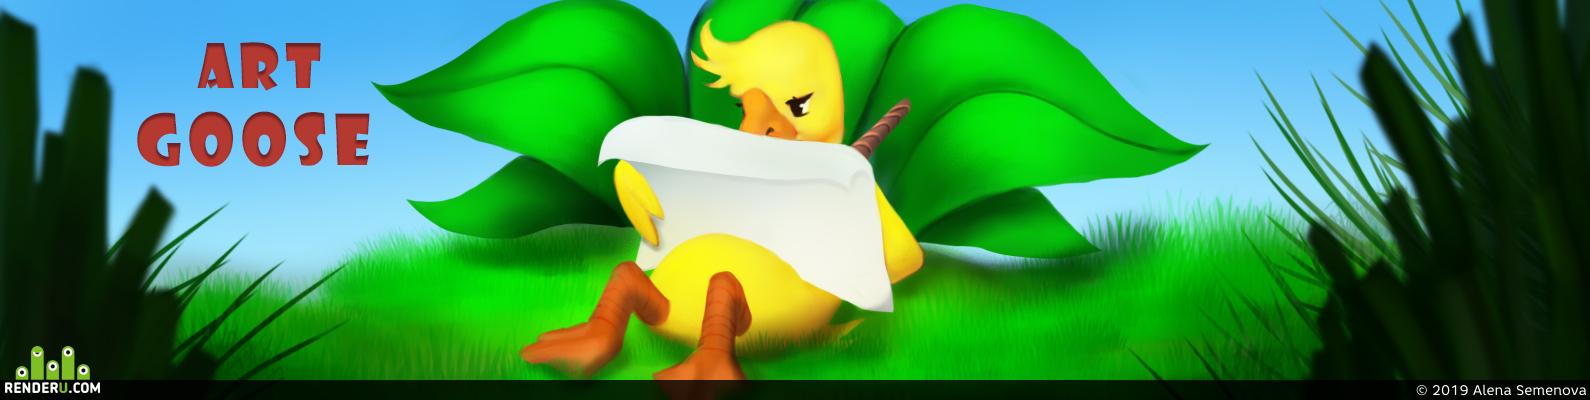 preview Art goose